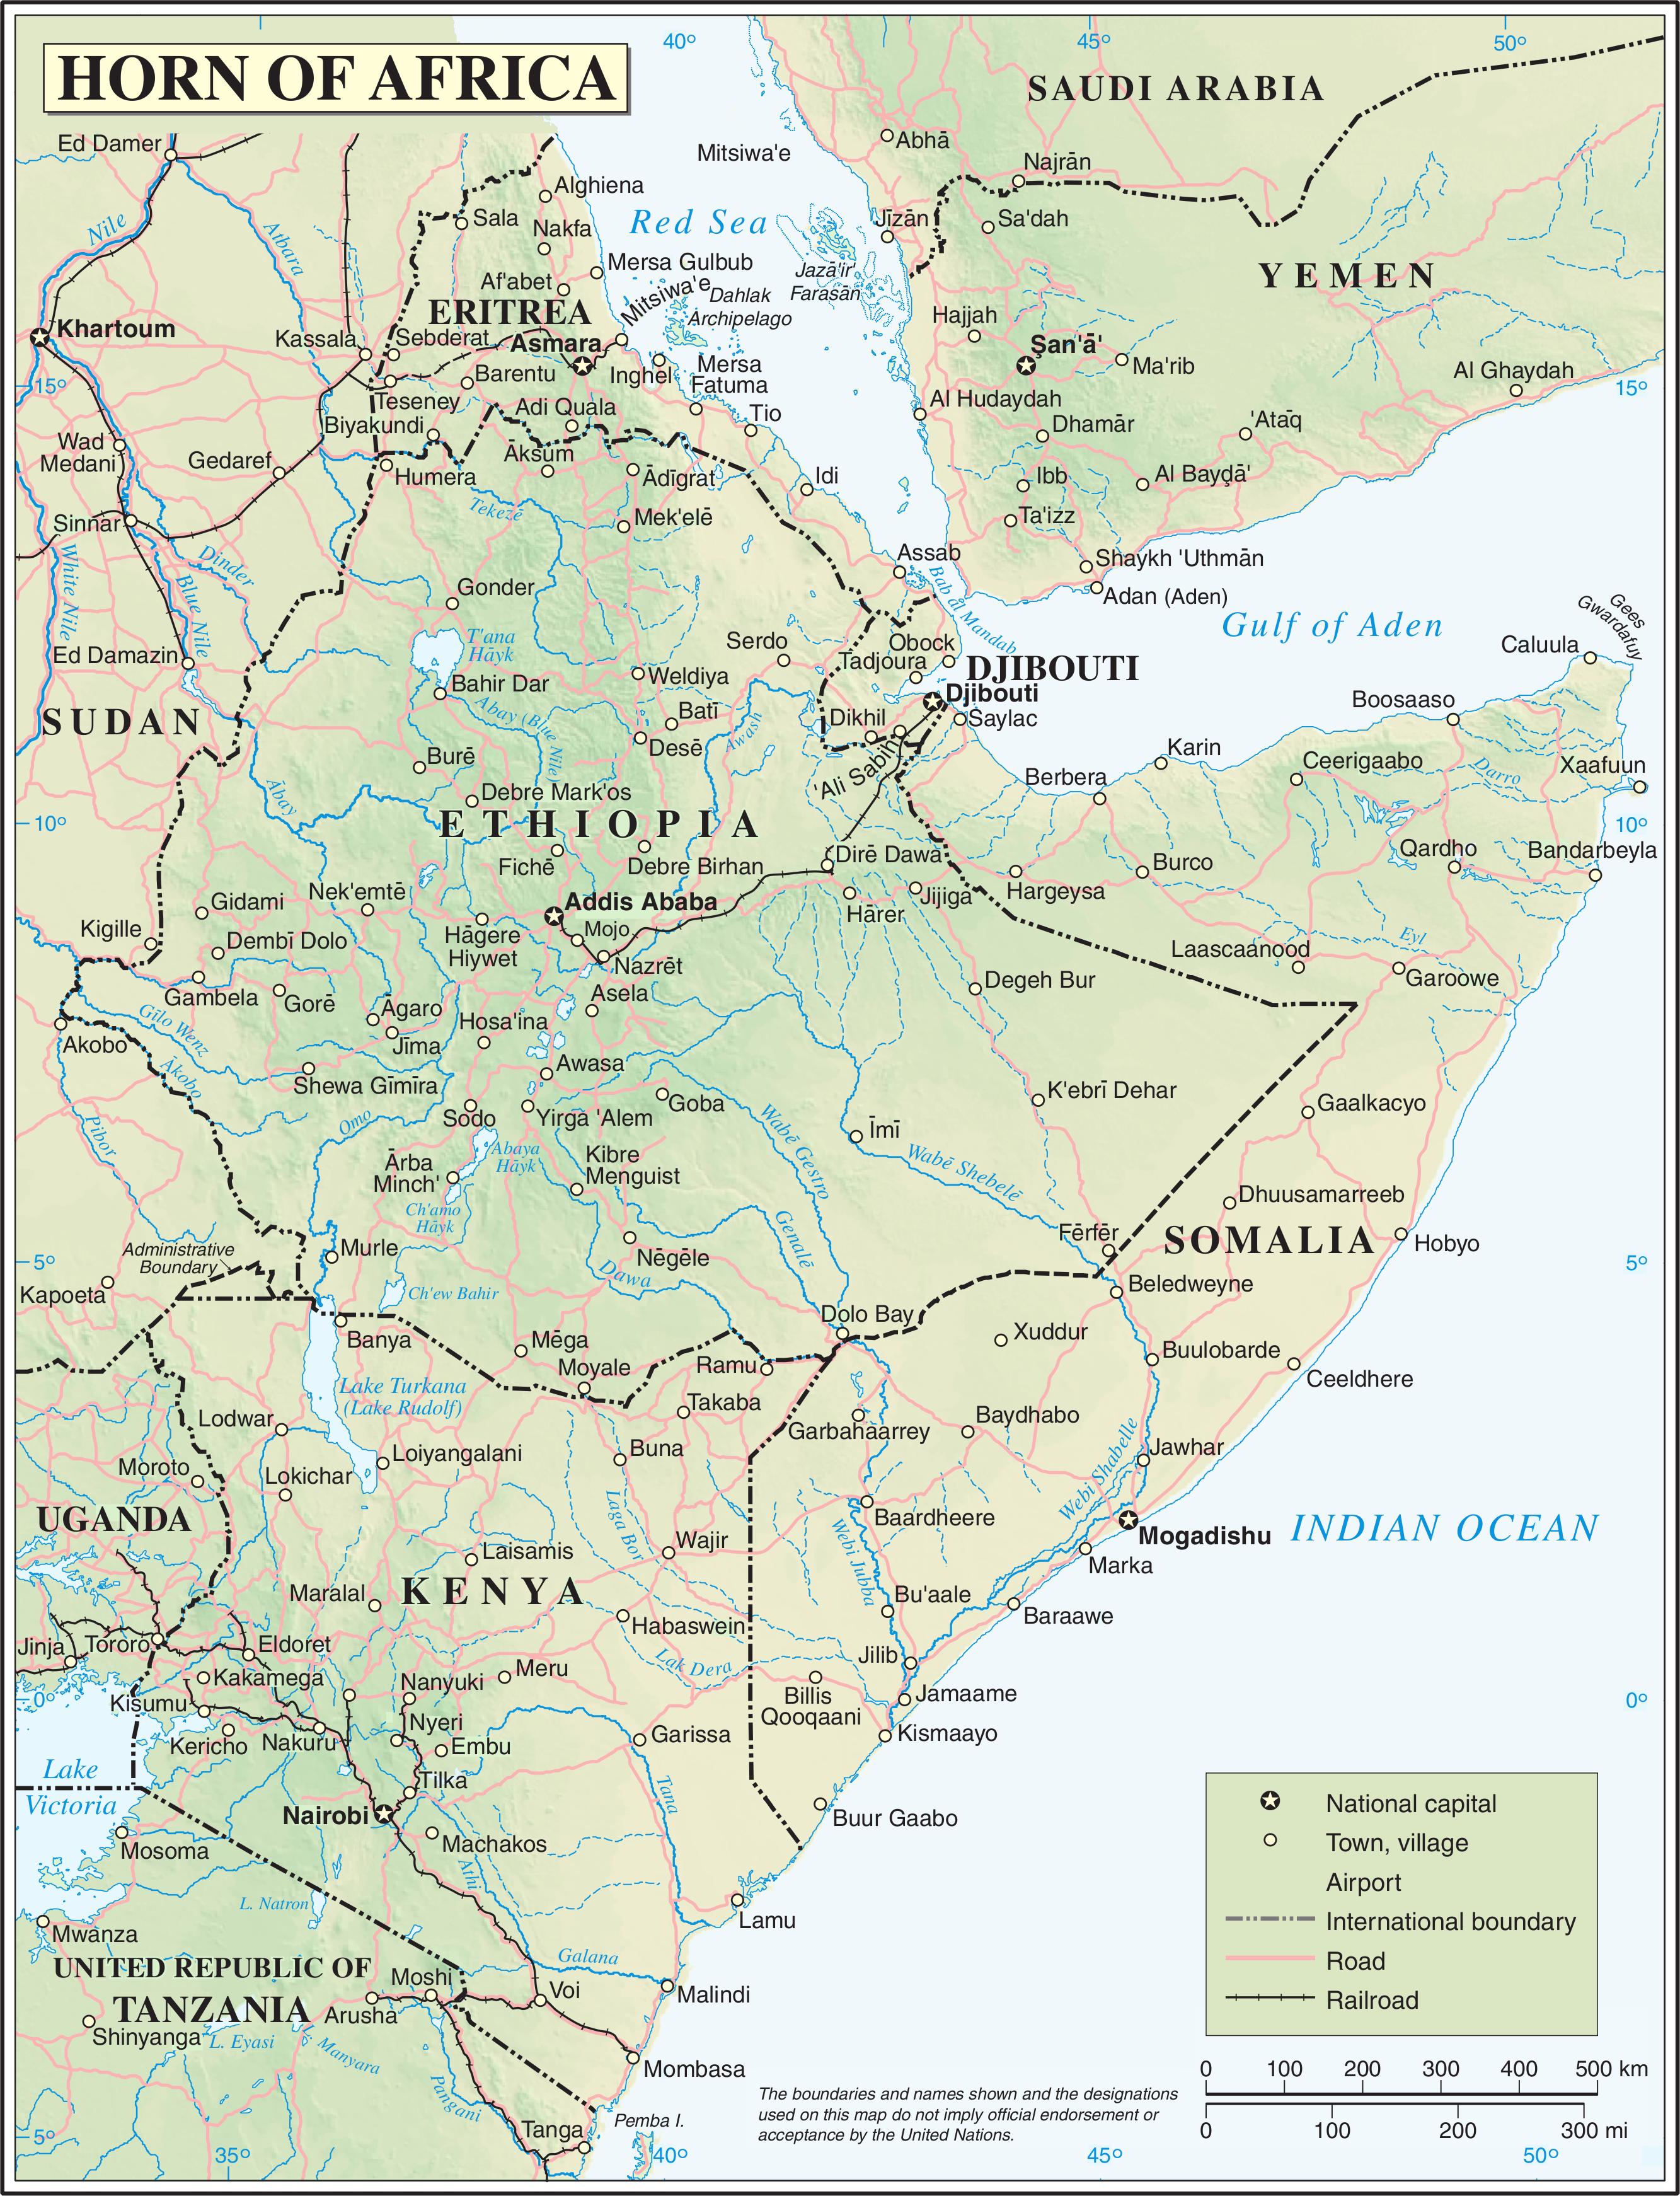 FileUnhornofafricareliefpng Wikimedia Commons - Horn of africa map